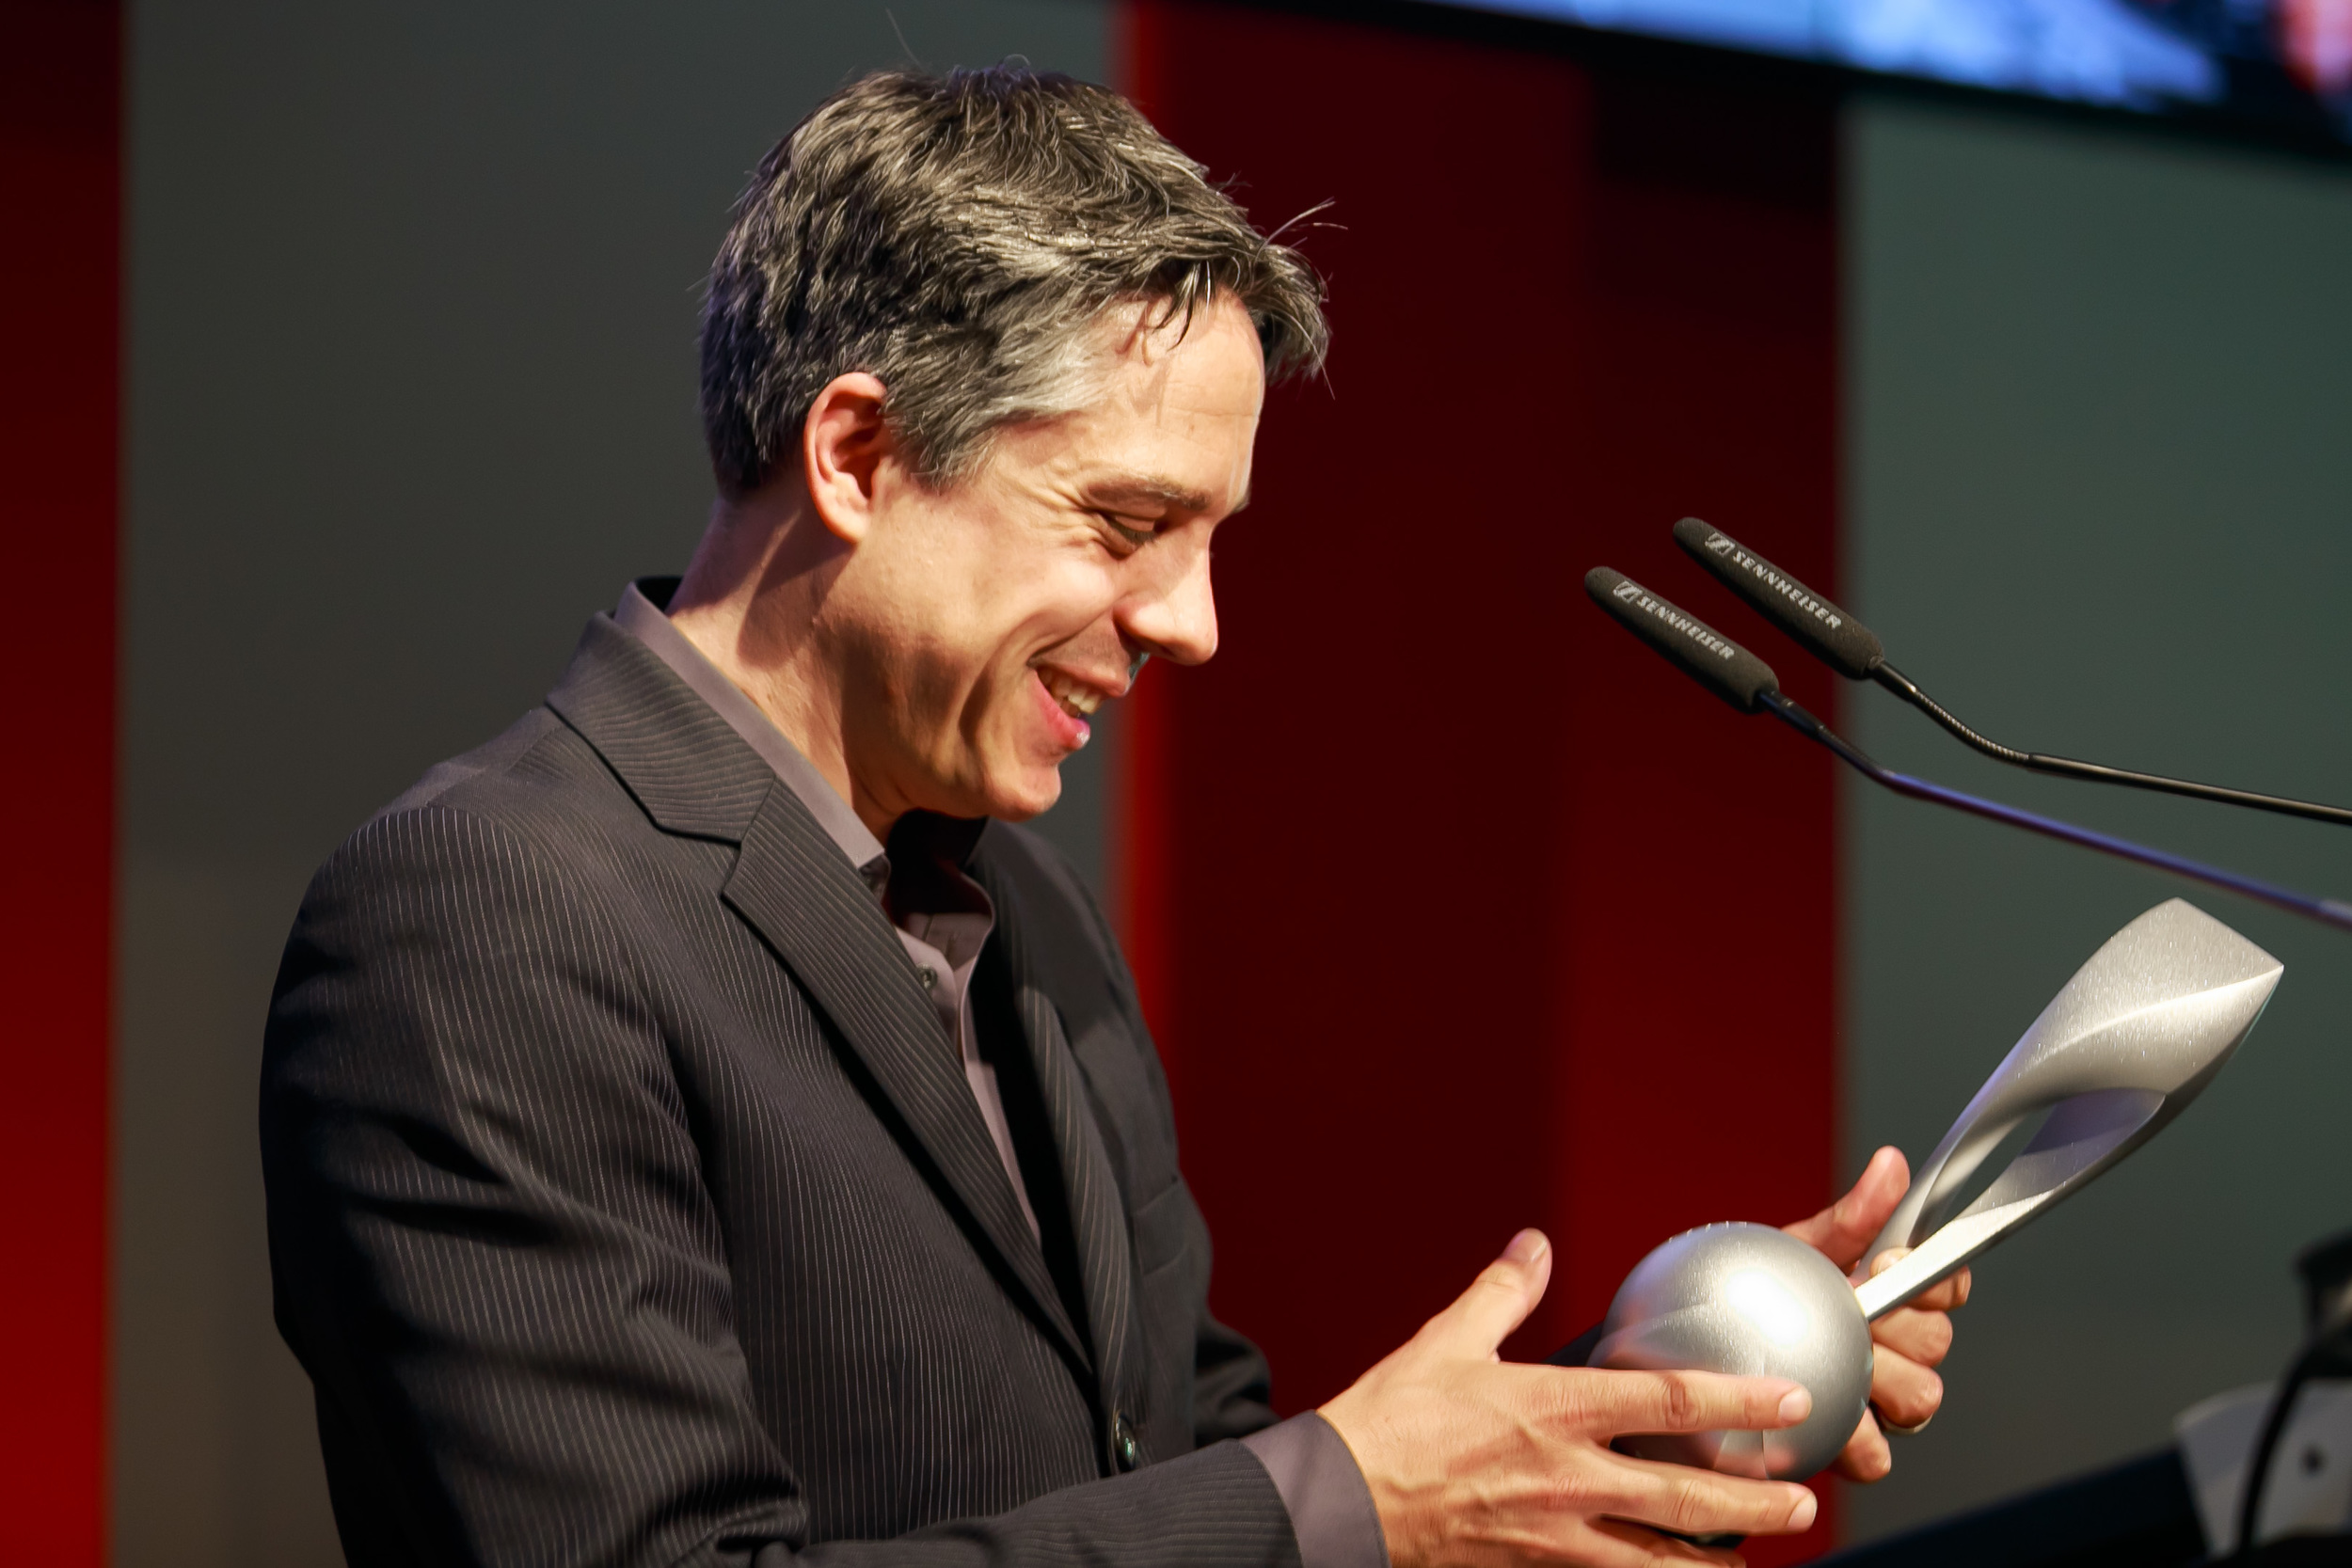 Fabian Römer - Preisträger Komposition Audiovisuelle Medien © Thomas Rosenthal